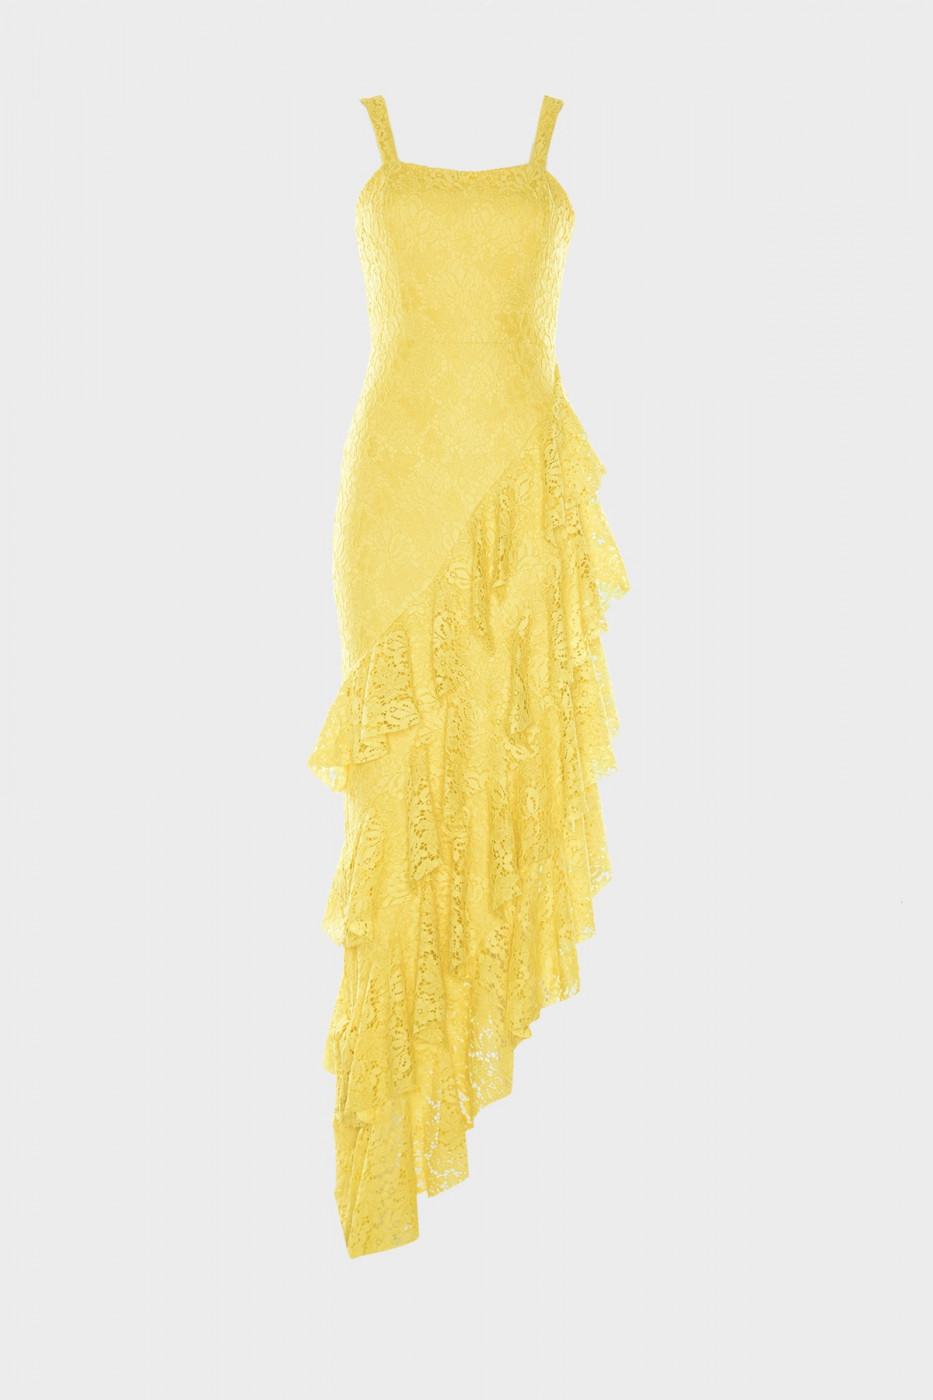 Trendyol Yellow Volli Dantel Evening Dress & Graduation Dress